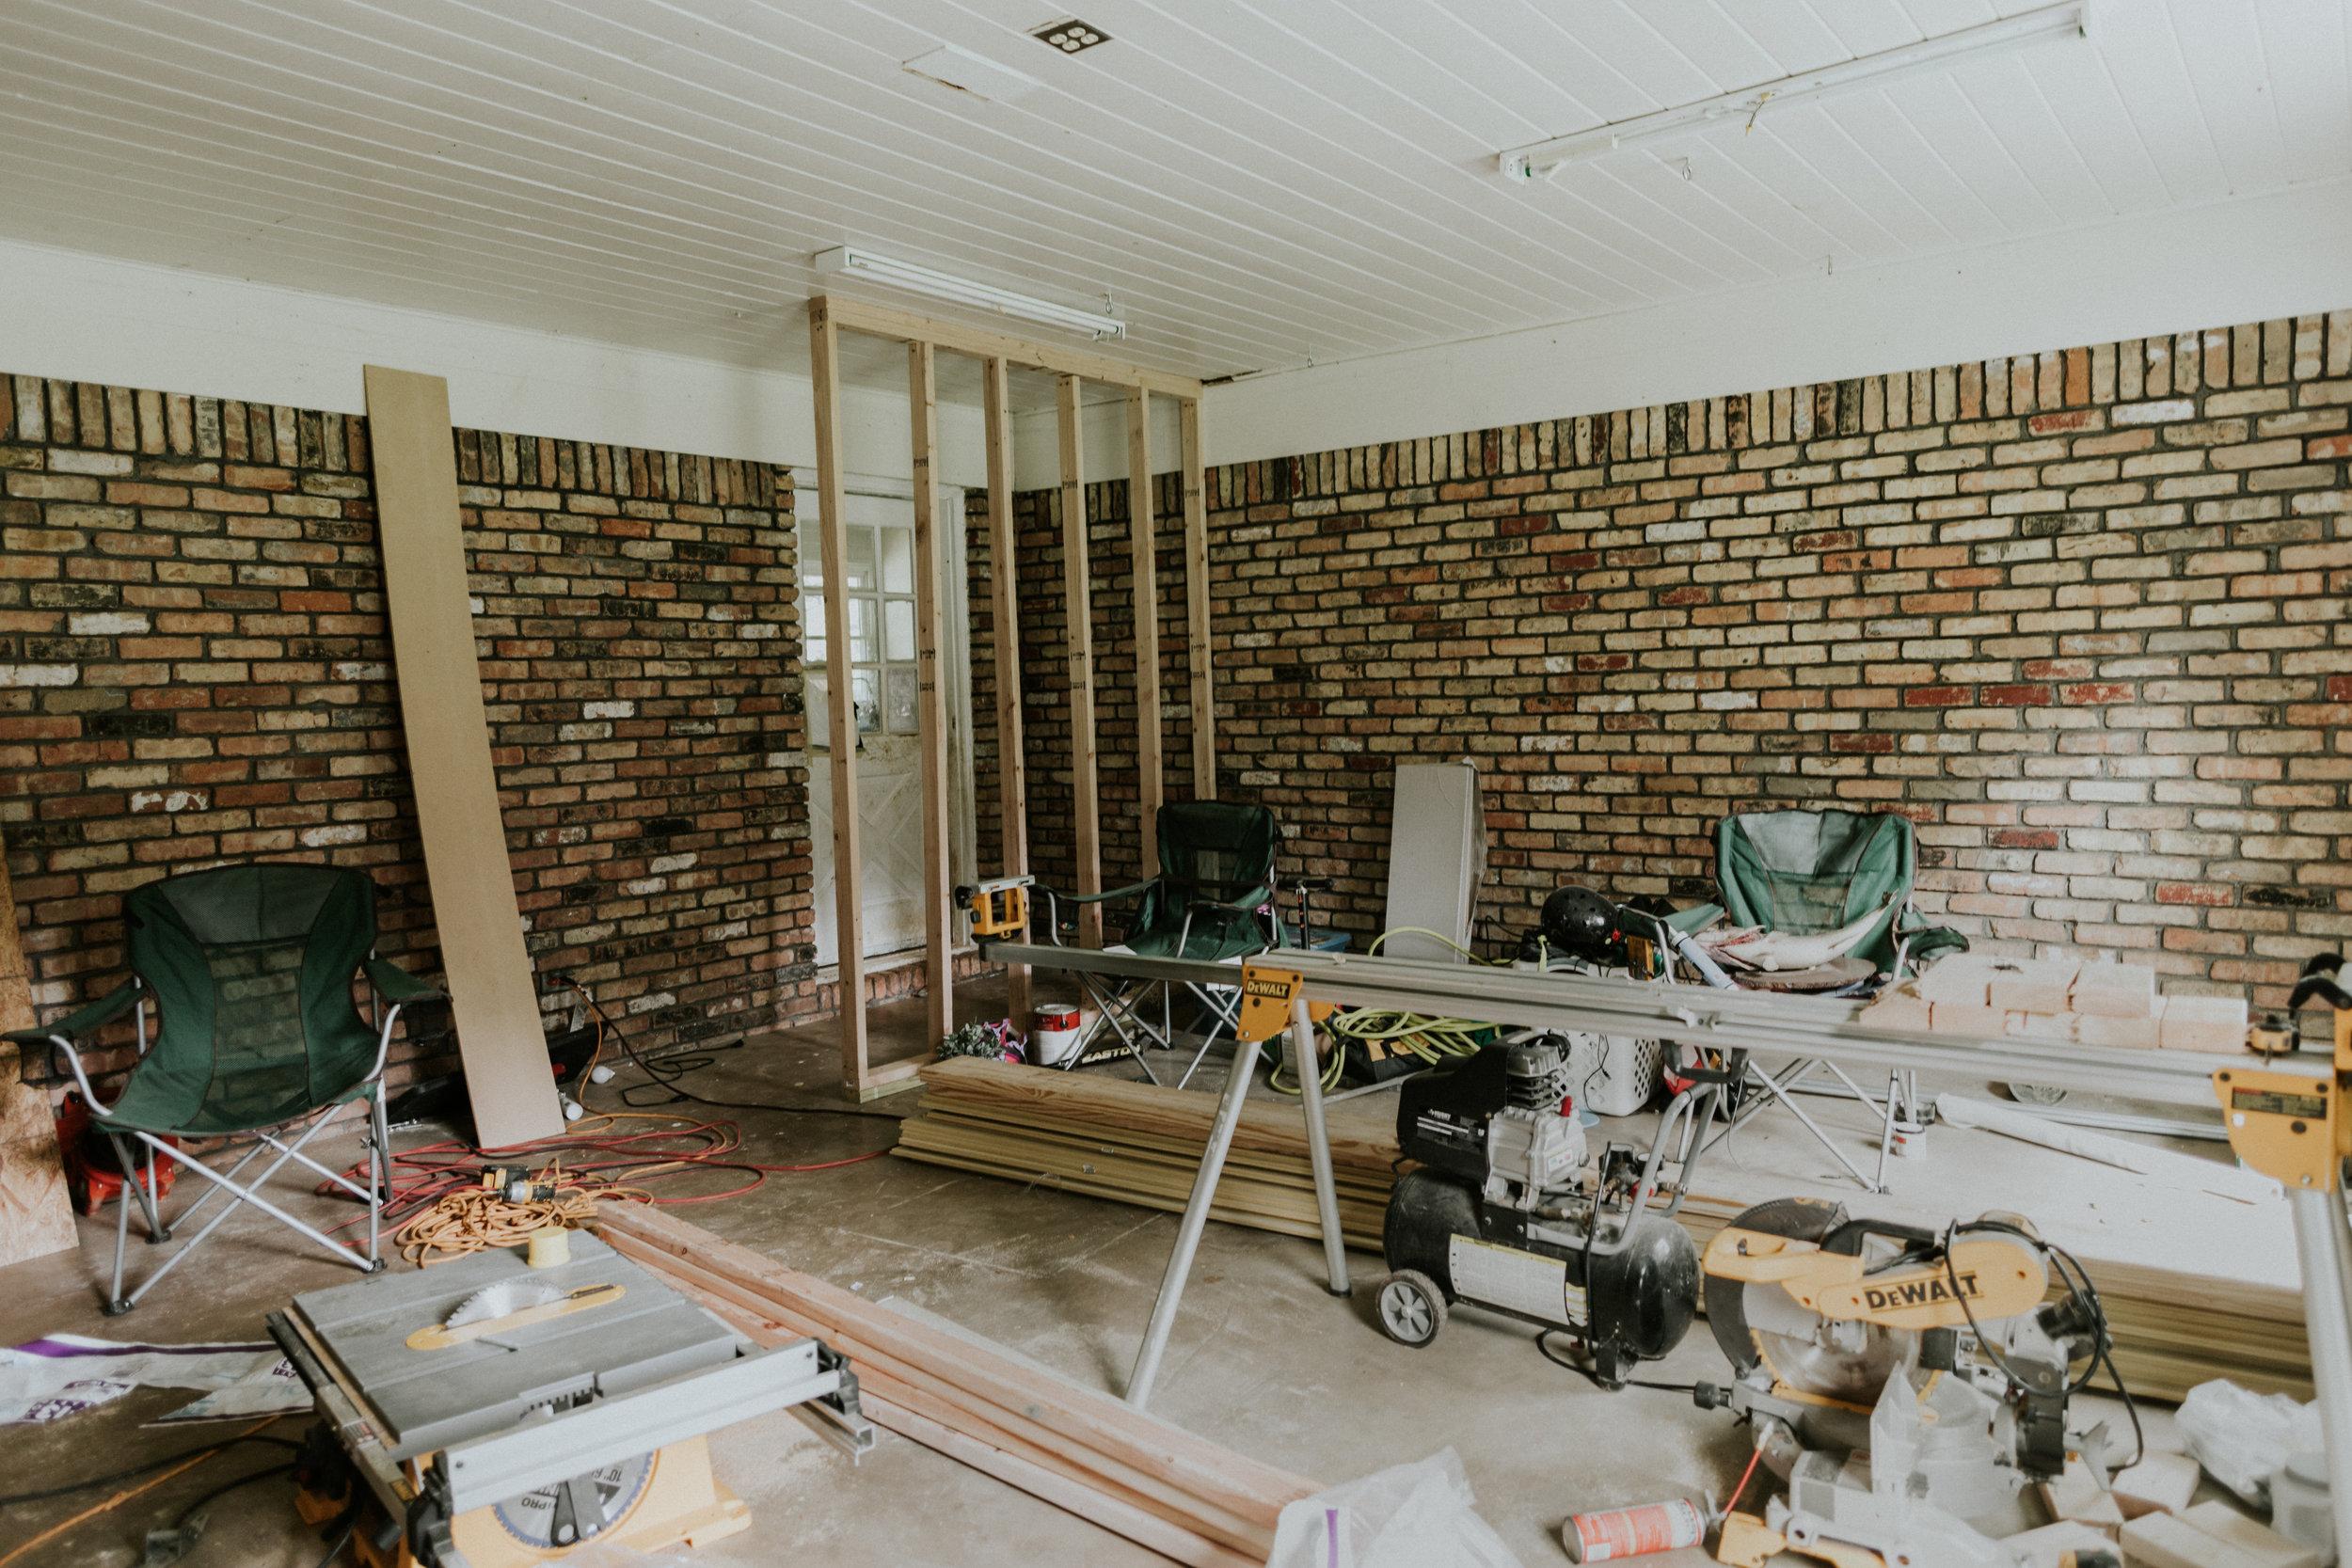 Enclosing a garage into livable space